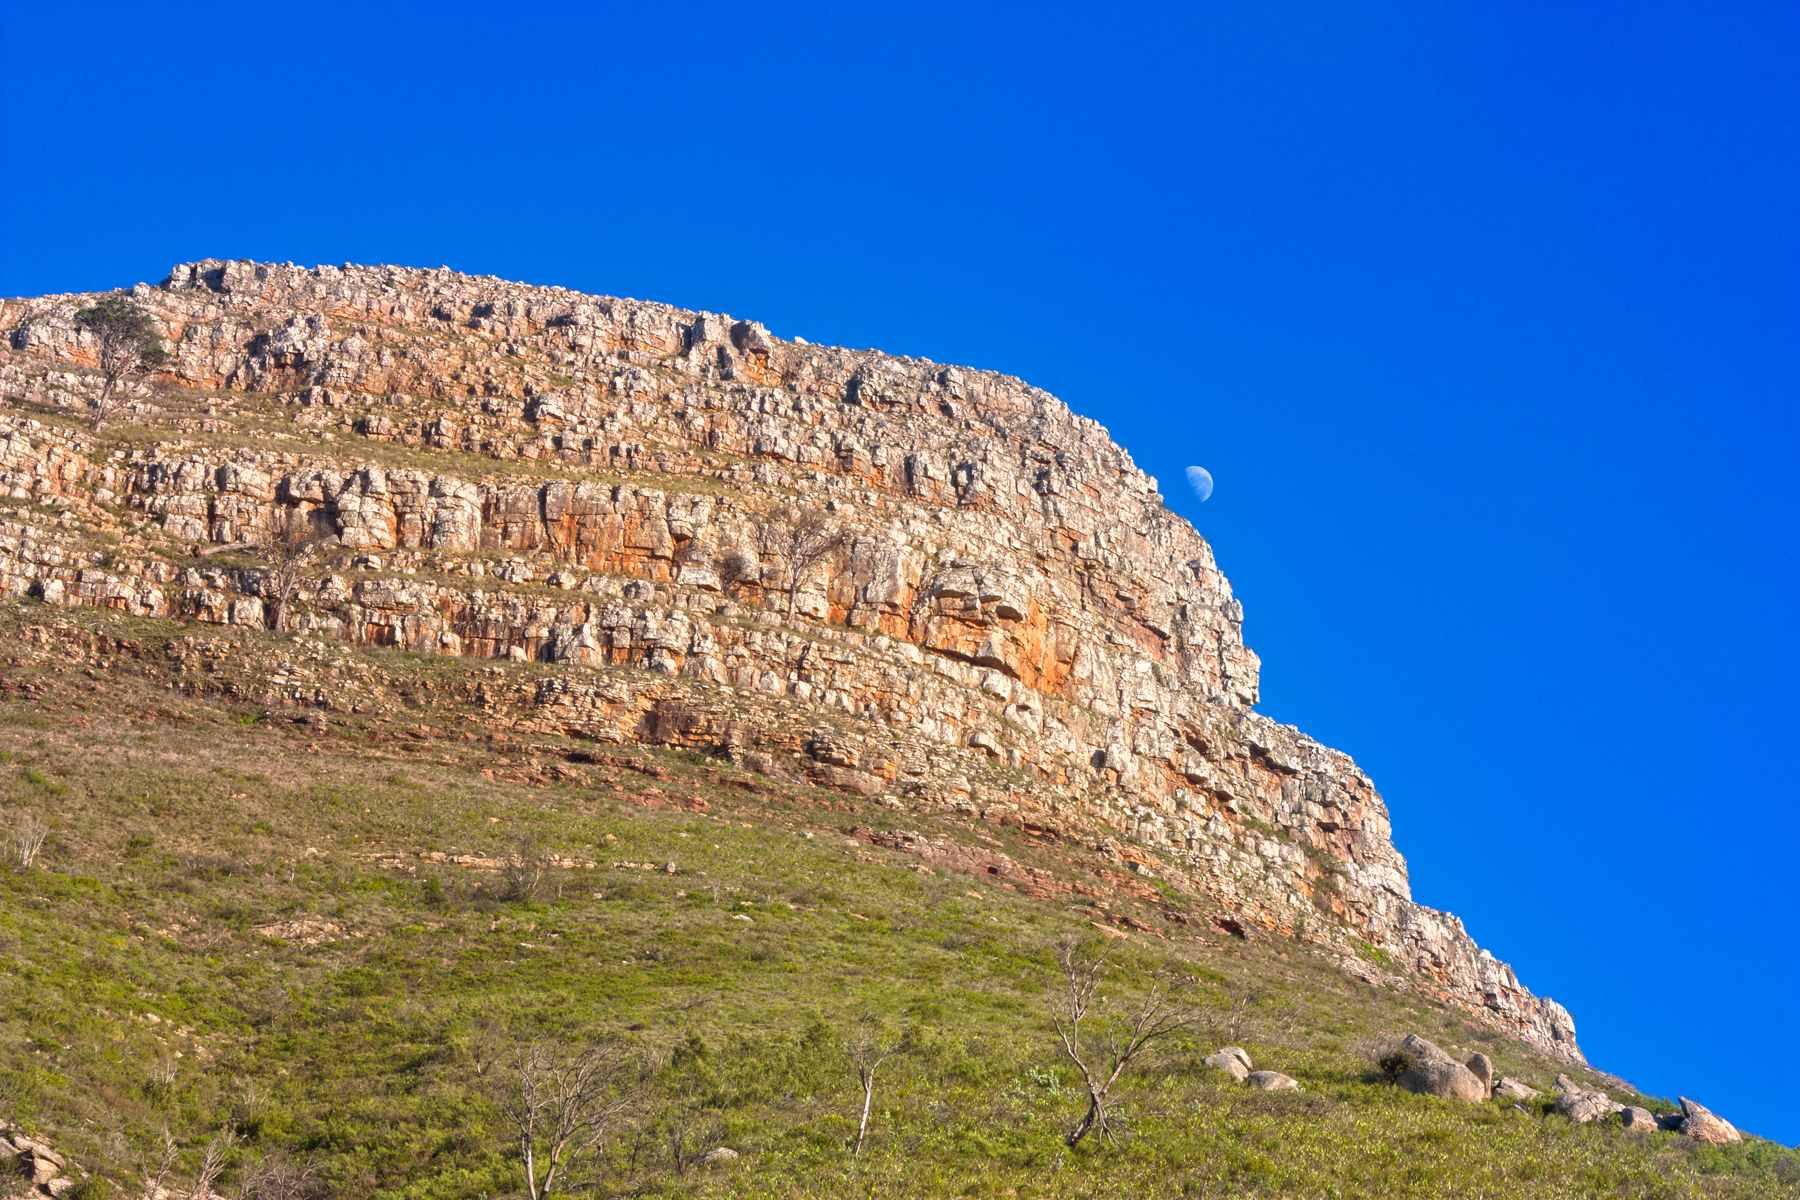 Lion's head mountain - hdr photo